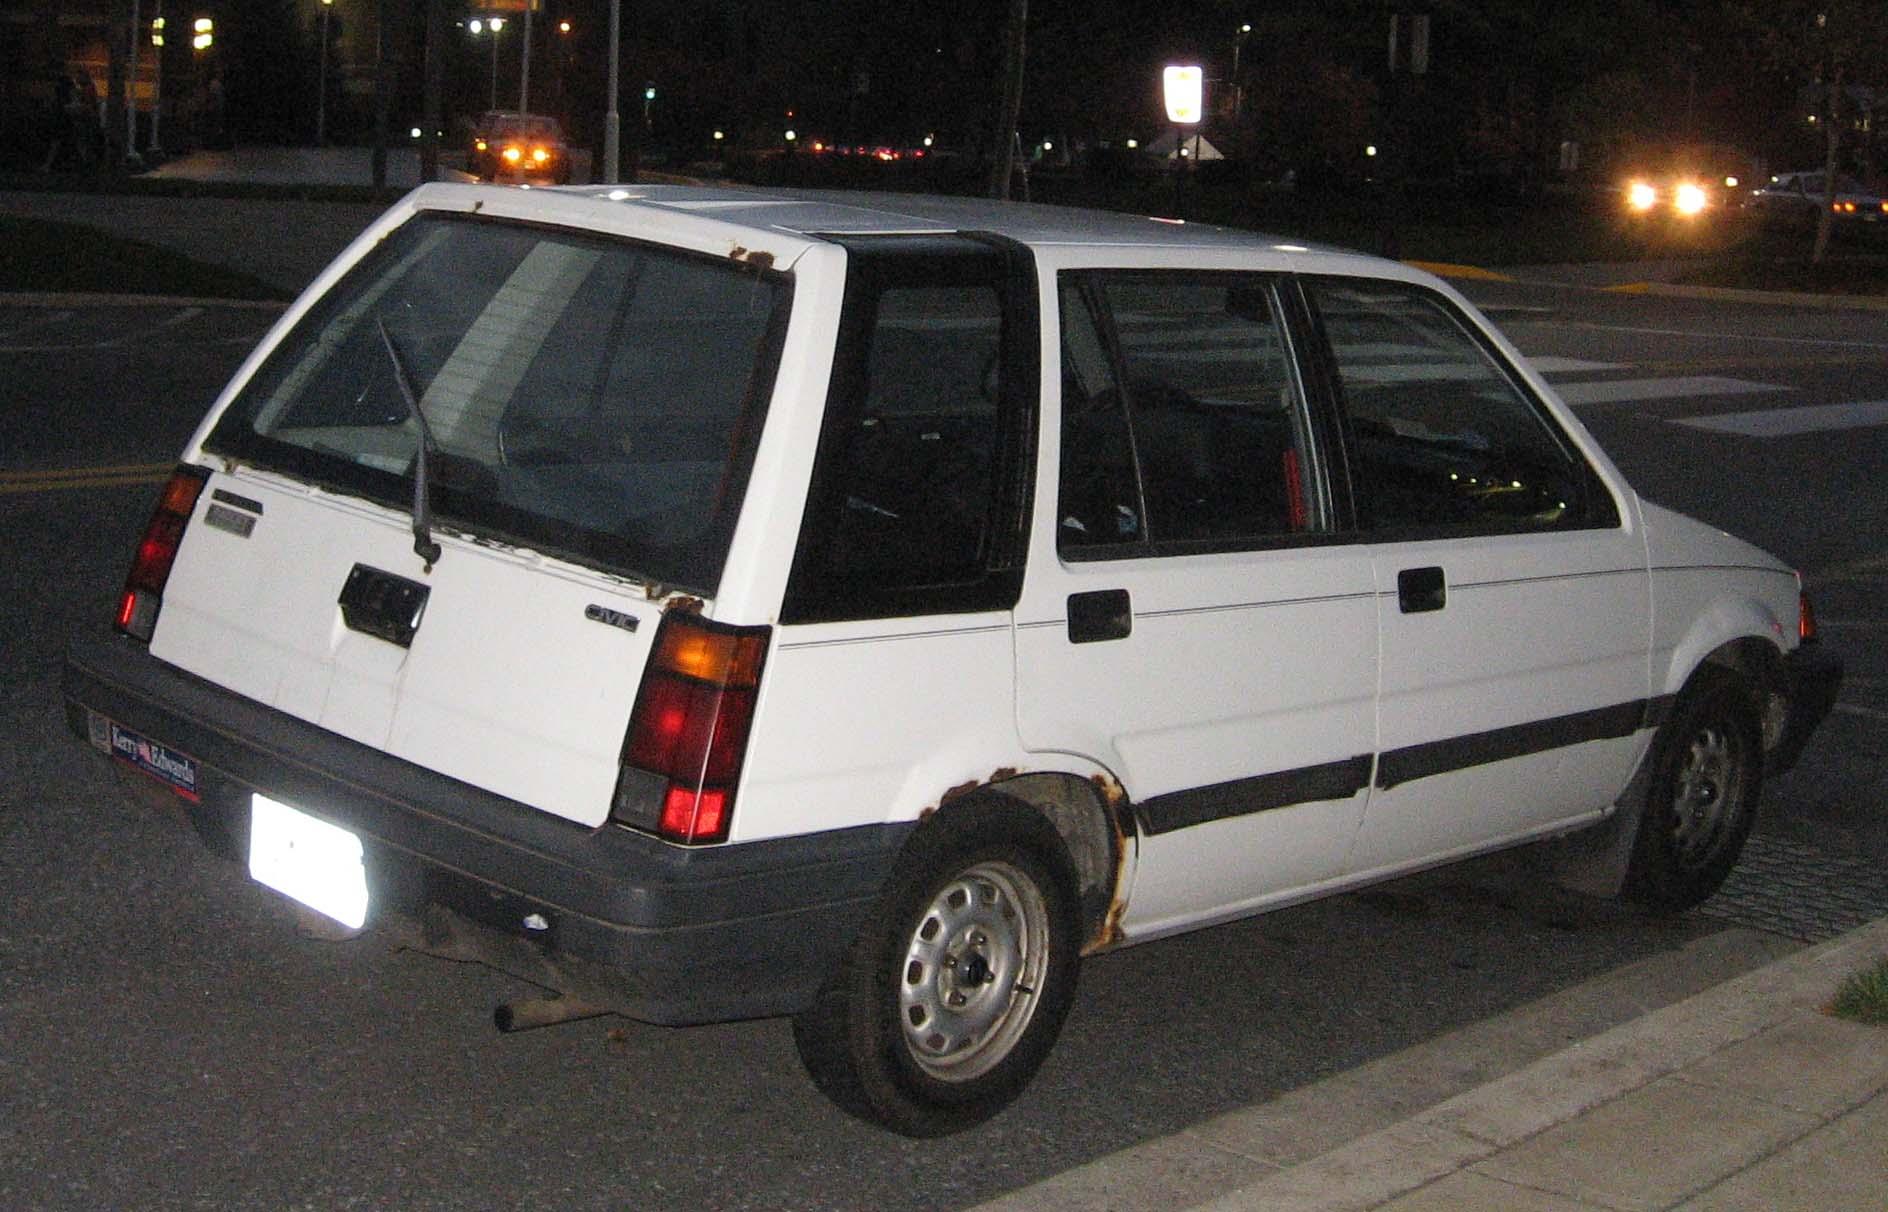 File:Honda Civic wagon.jpg - Wikimedia Commons